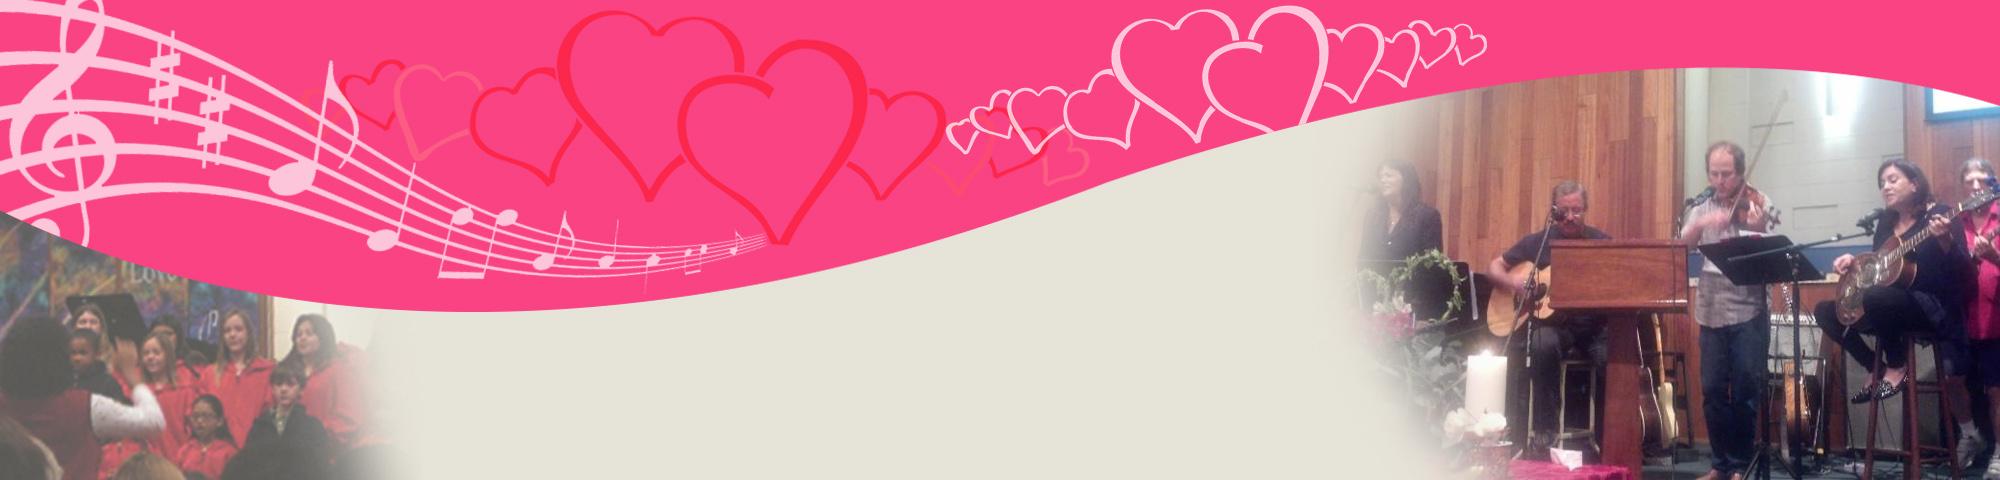 Love-Sunday-Slider